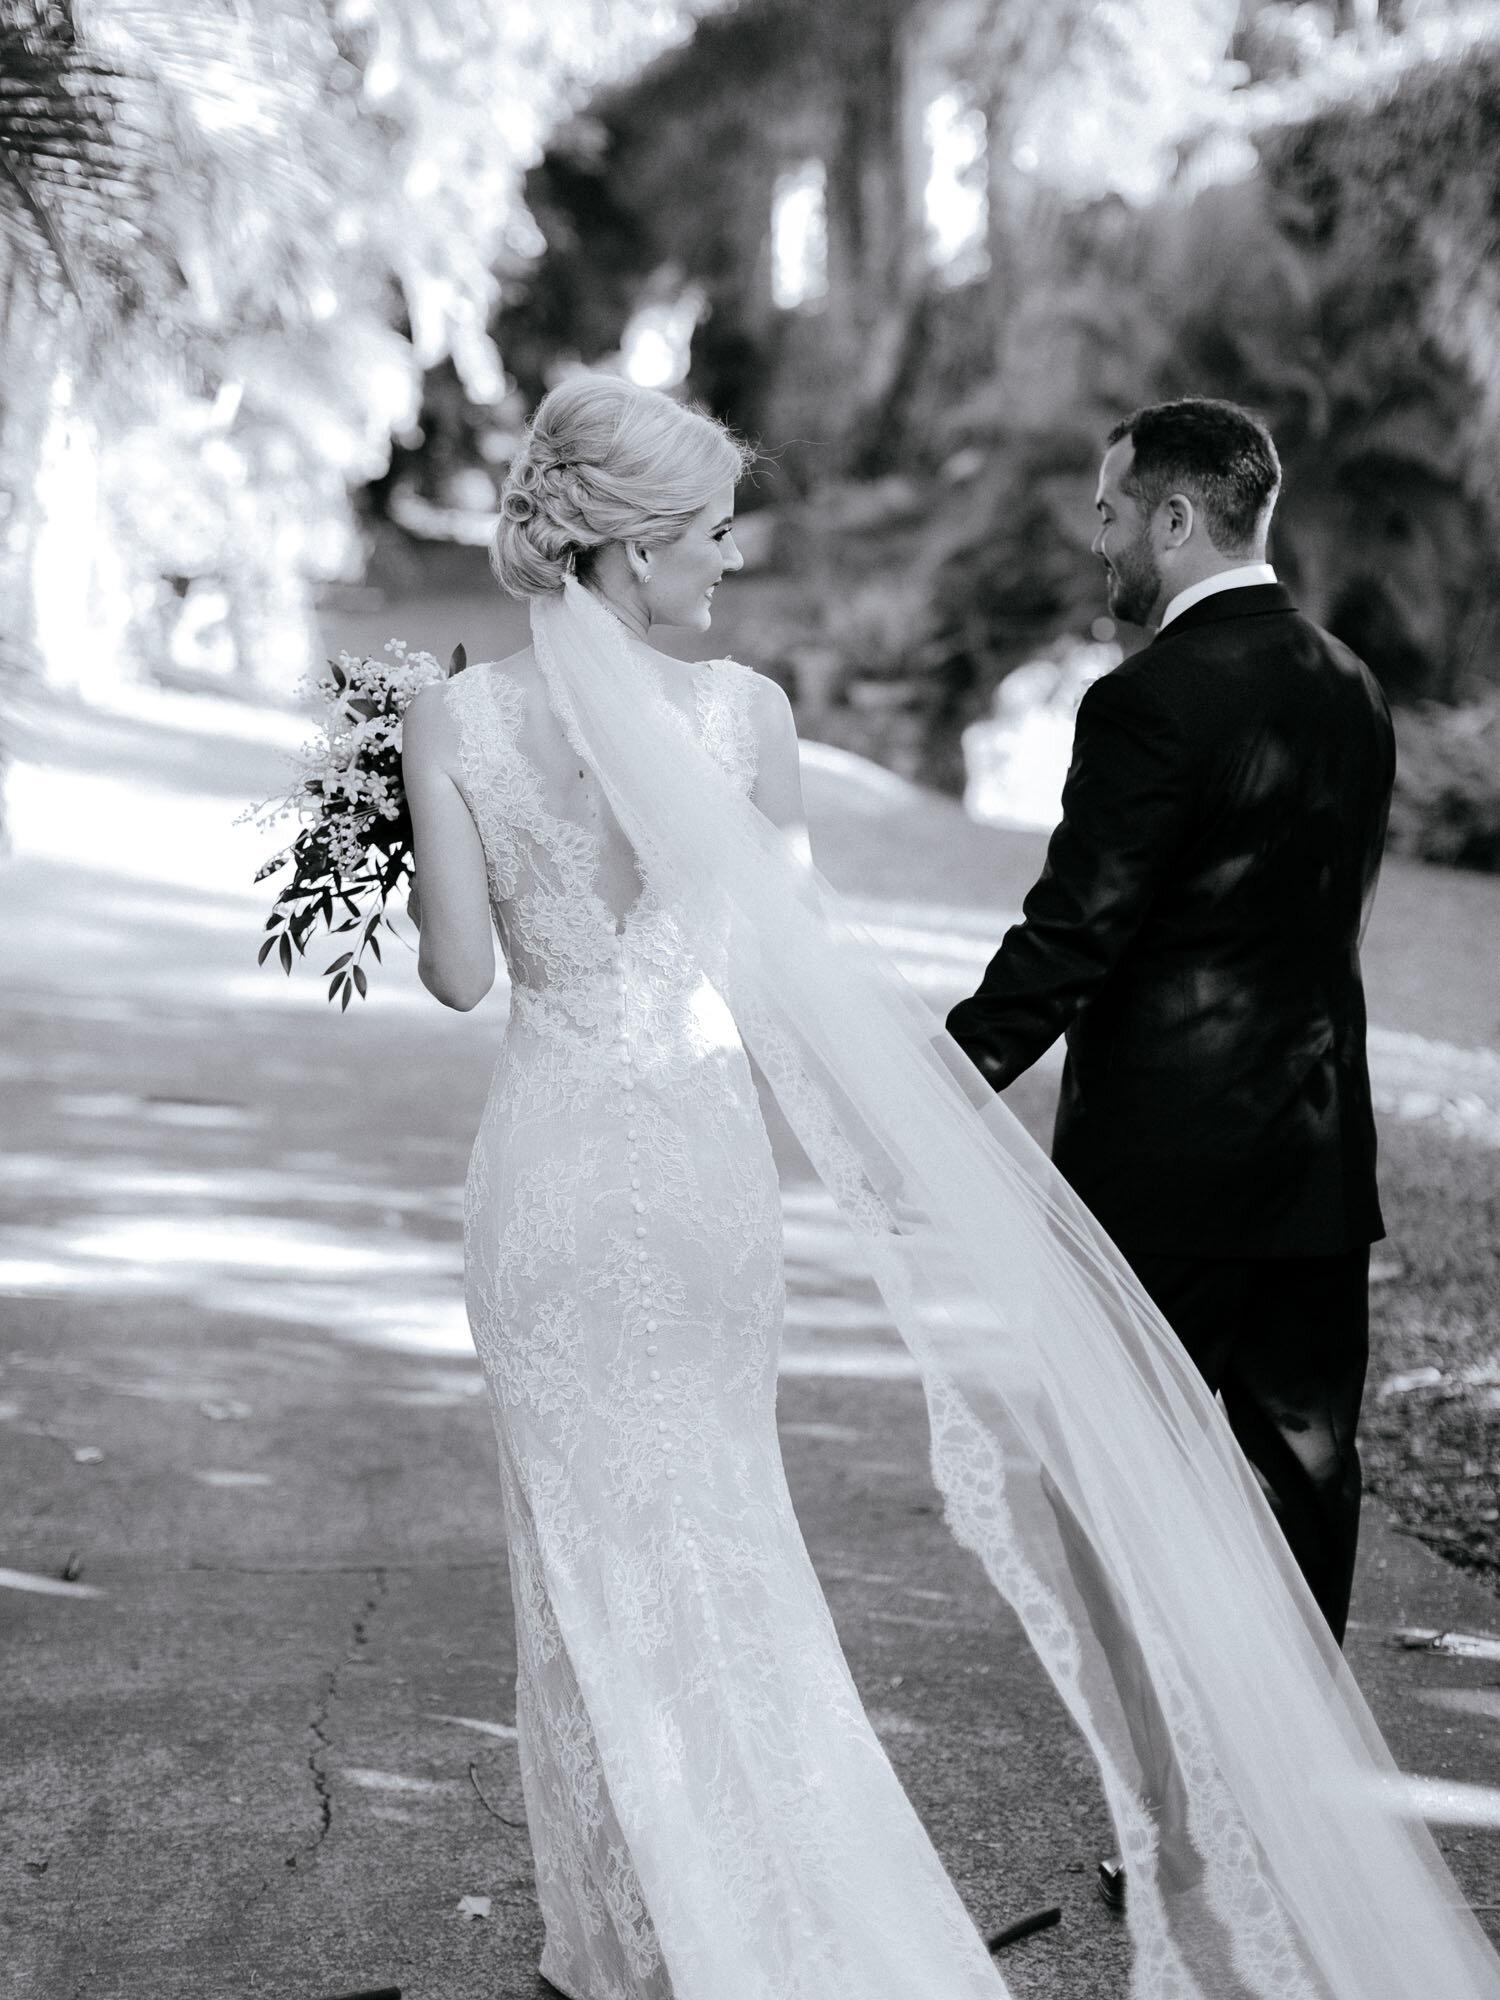 Chris-J-Evans-Maui-Wedding-Kim&Brian3258-Copy1.jpg